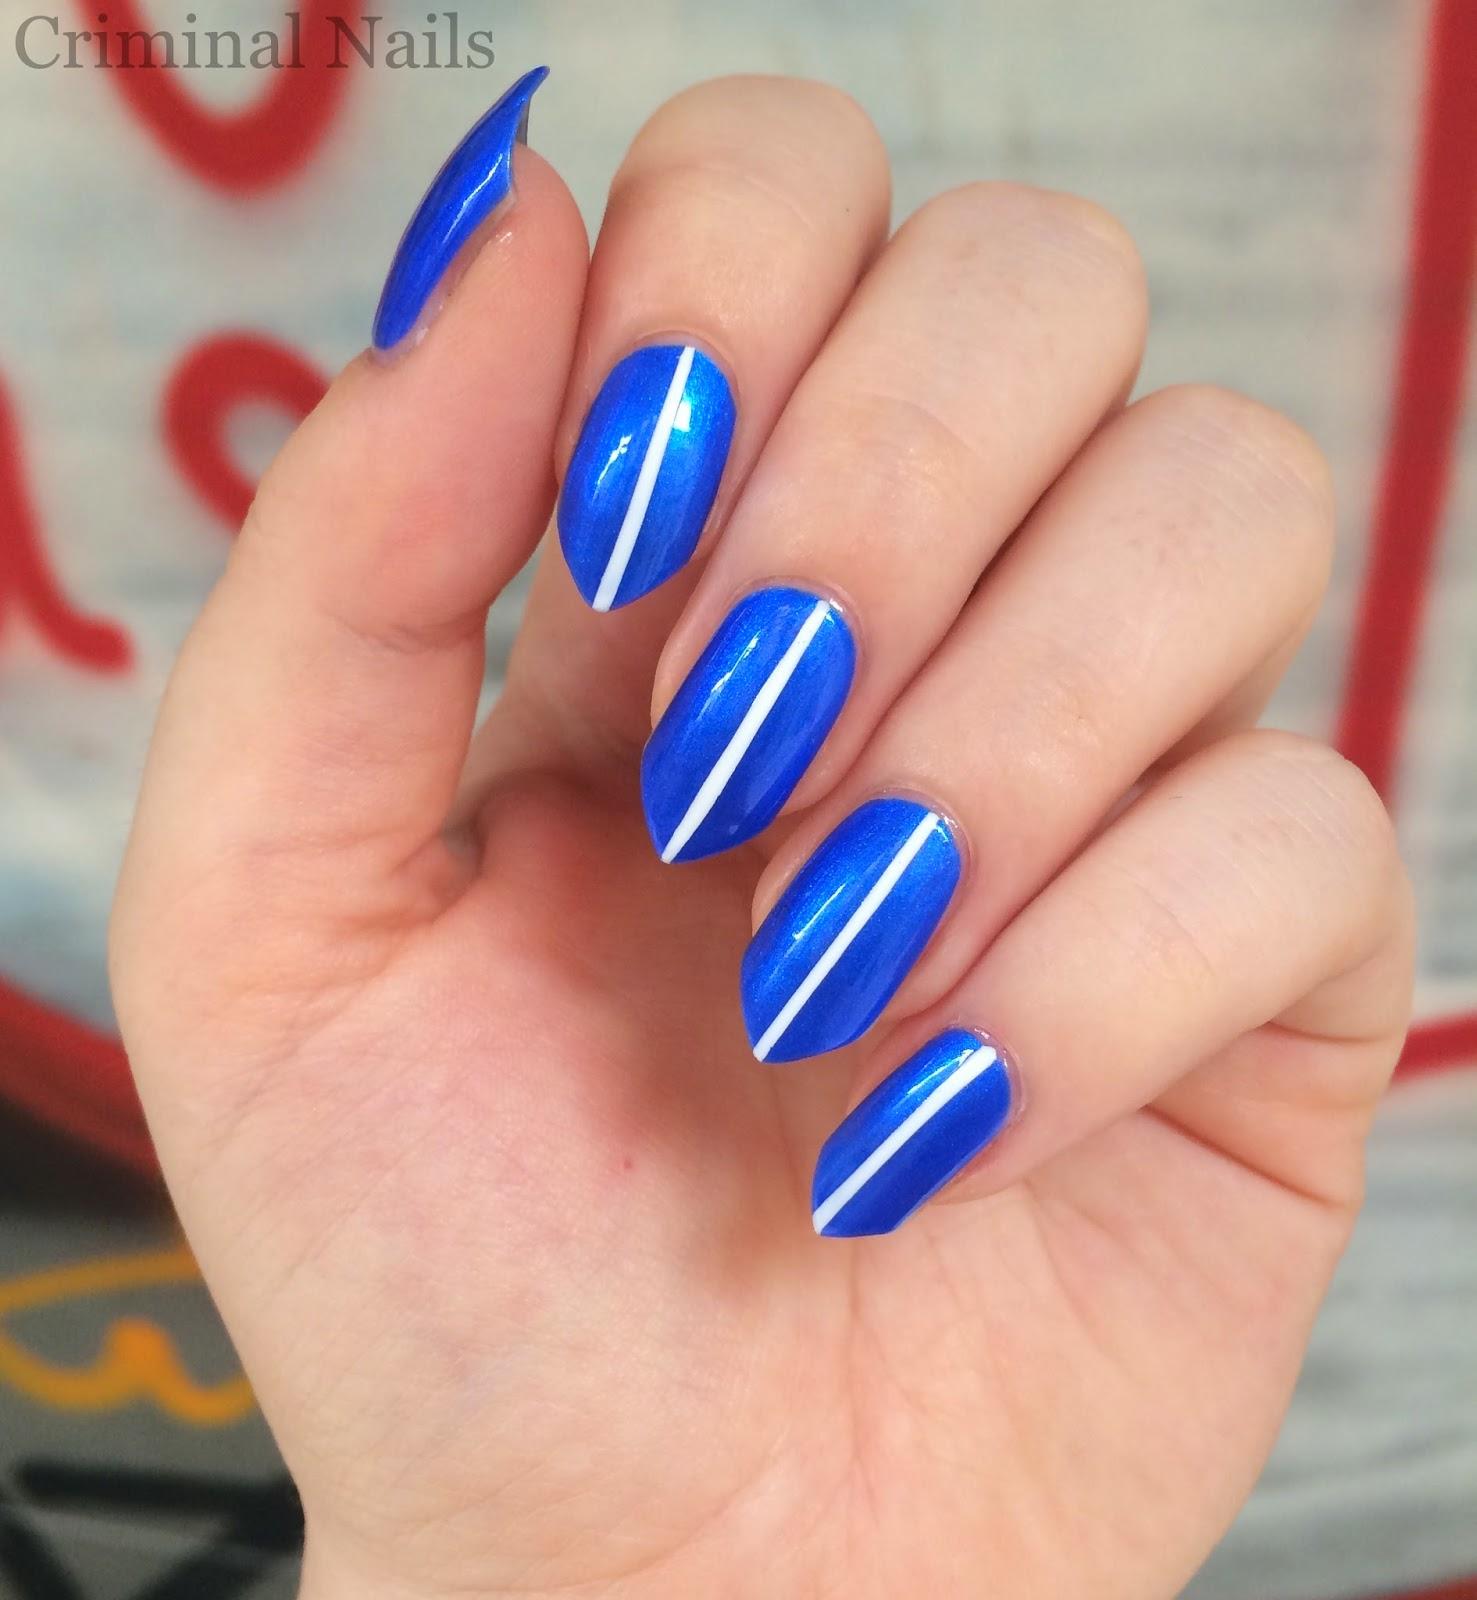 Criminal Nails: Kiko Quik Dry 380